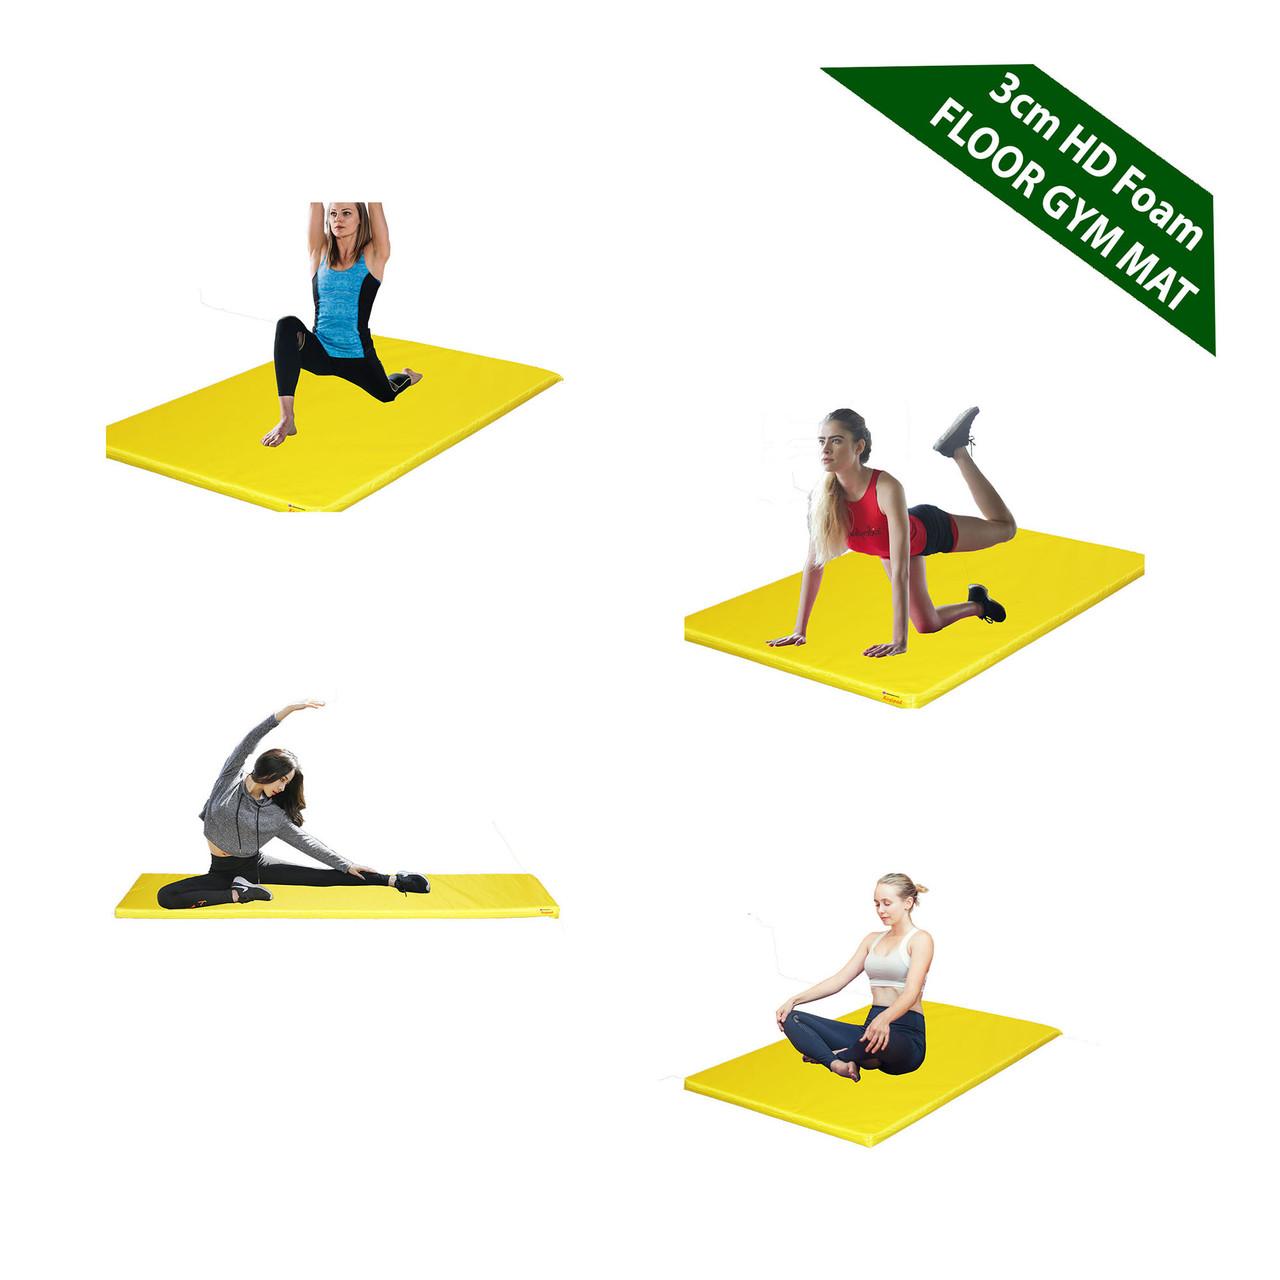 Kosipad 3cm Thick foam floor gym crash mats Yellow Main